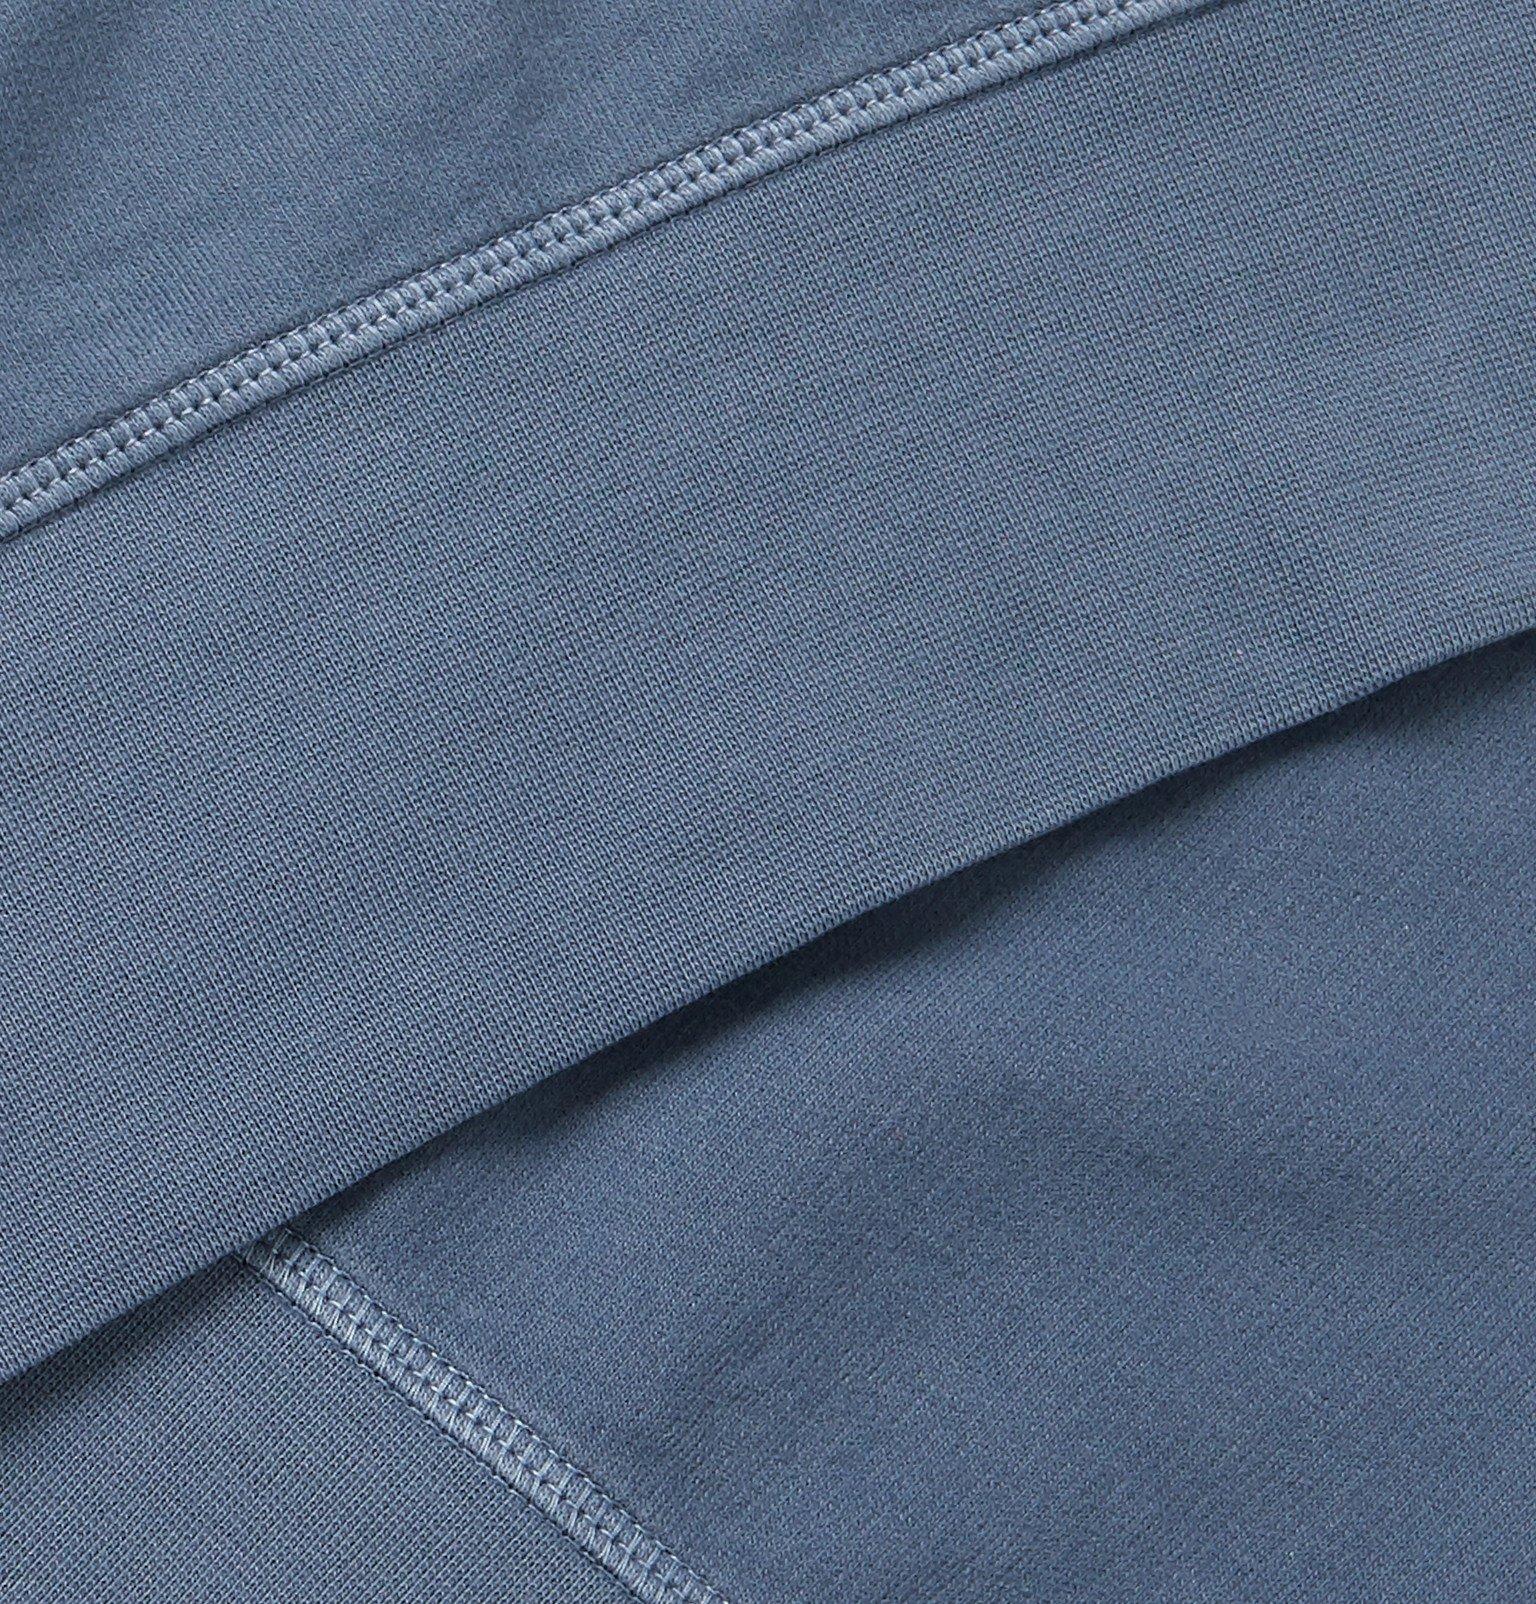 Officine Generale - Clement Pigment-Dyed Loopback Cotton-Jersey Sweatshirt - Blue